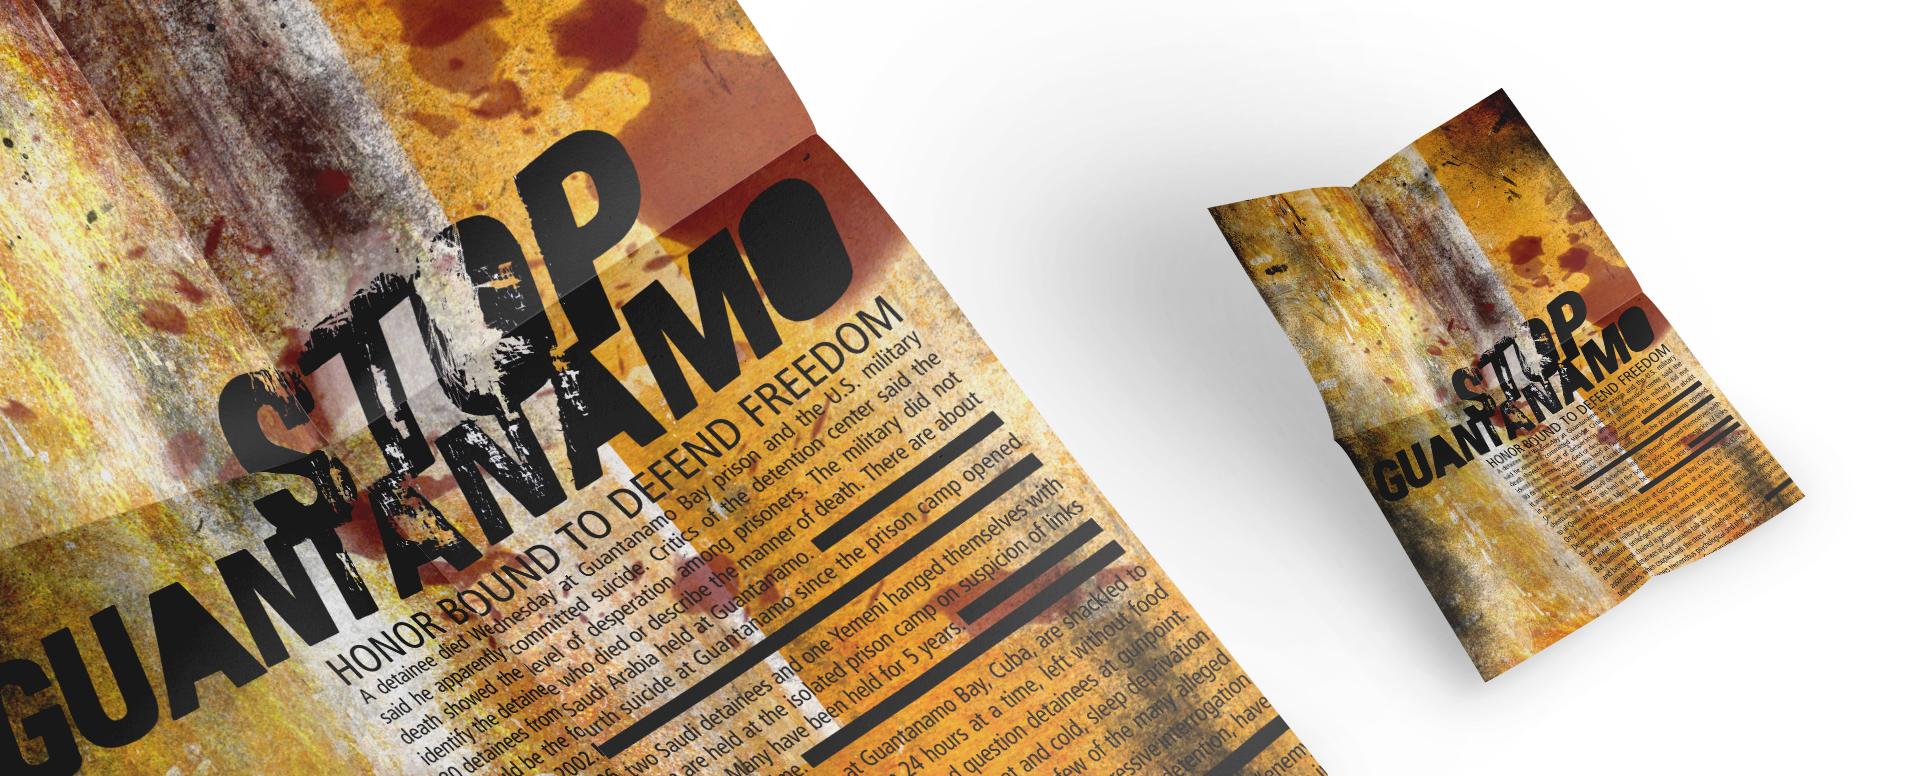 Design-Grafico-Graphic-Design-Cartaz-Poster-Desdobravel-Leaflet-Concurso-Competition-Stop-Guantanamo-bonjourmolotov.jpg